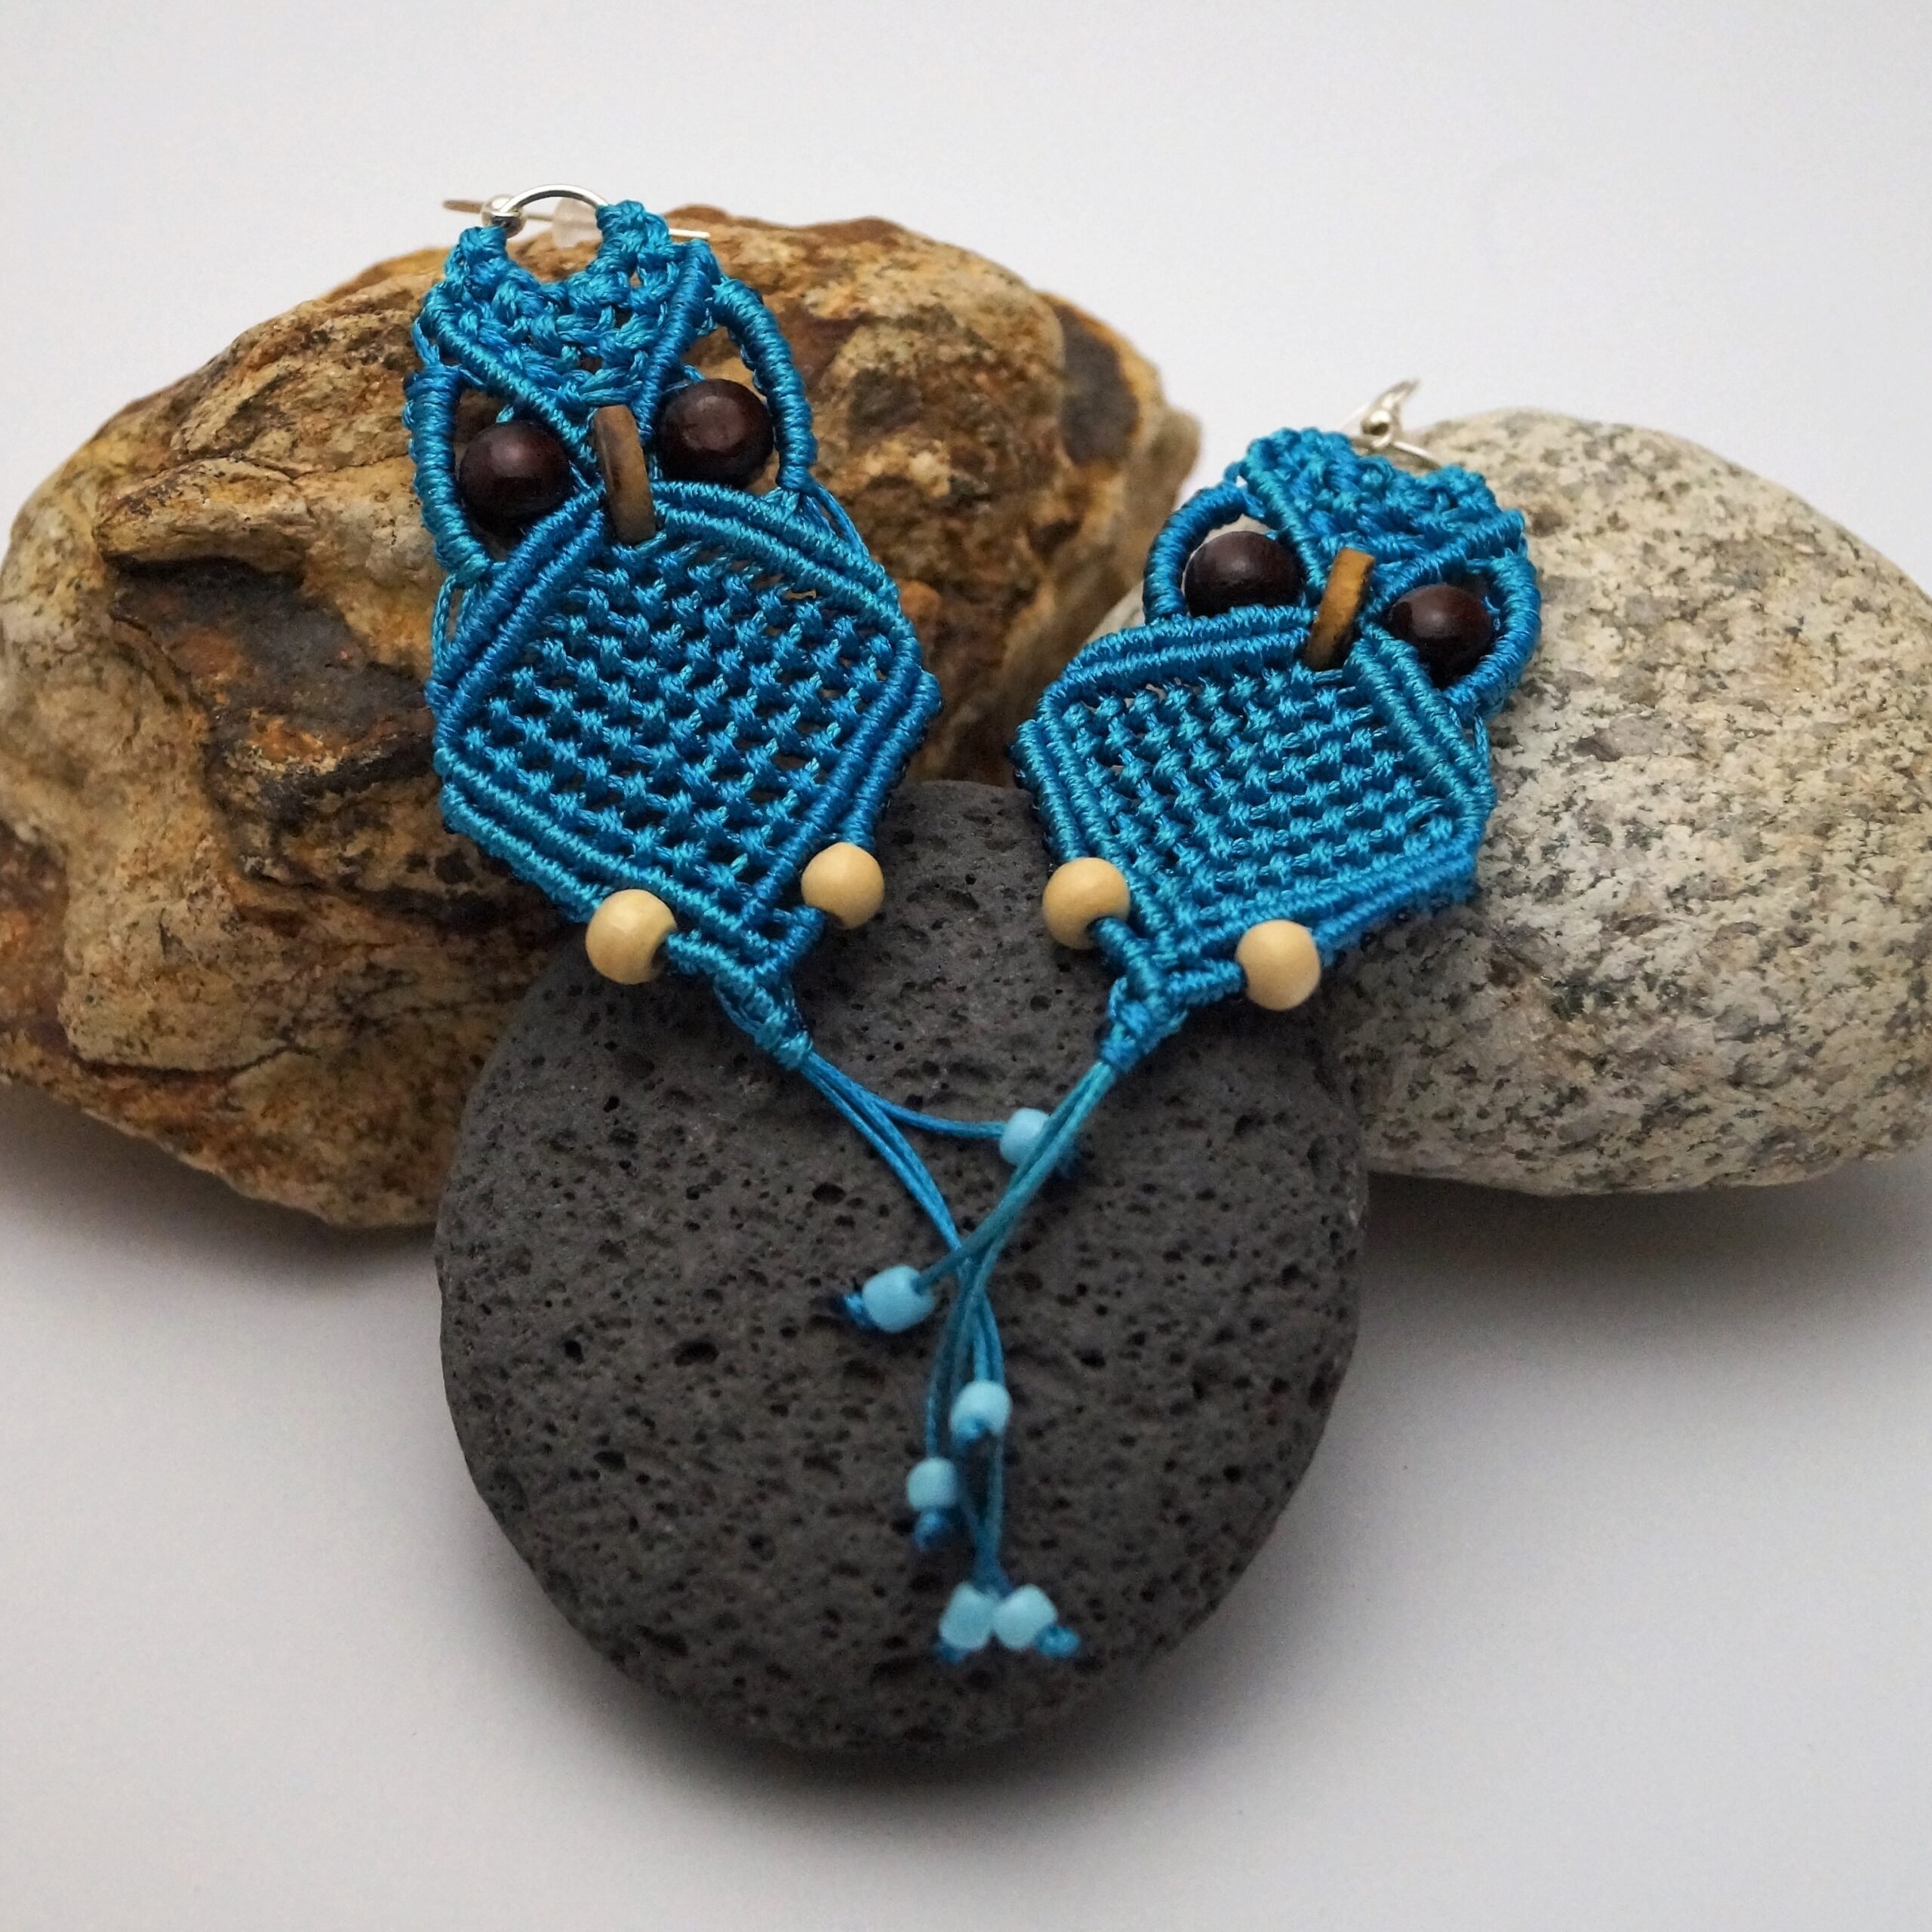 Macrame owl earring